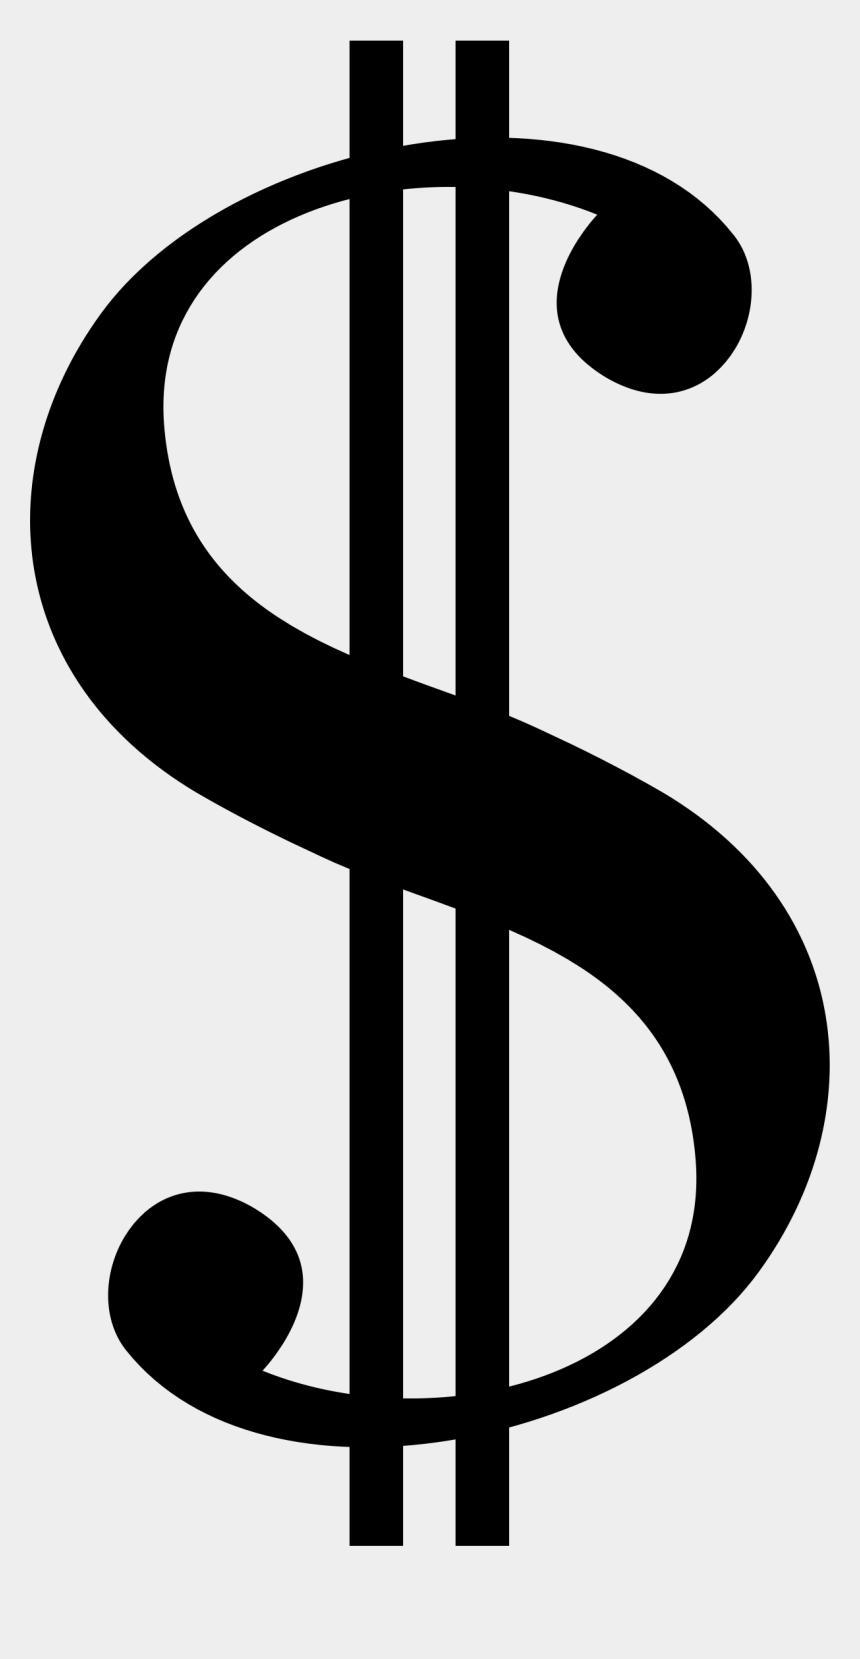 dollar sign clip art, Cartoons - Dollar Sign Serif - Dollar Sign Clipart Black And White